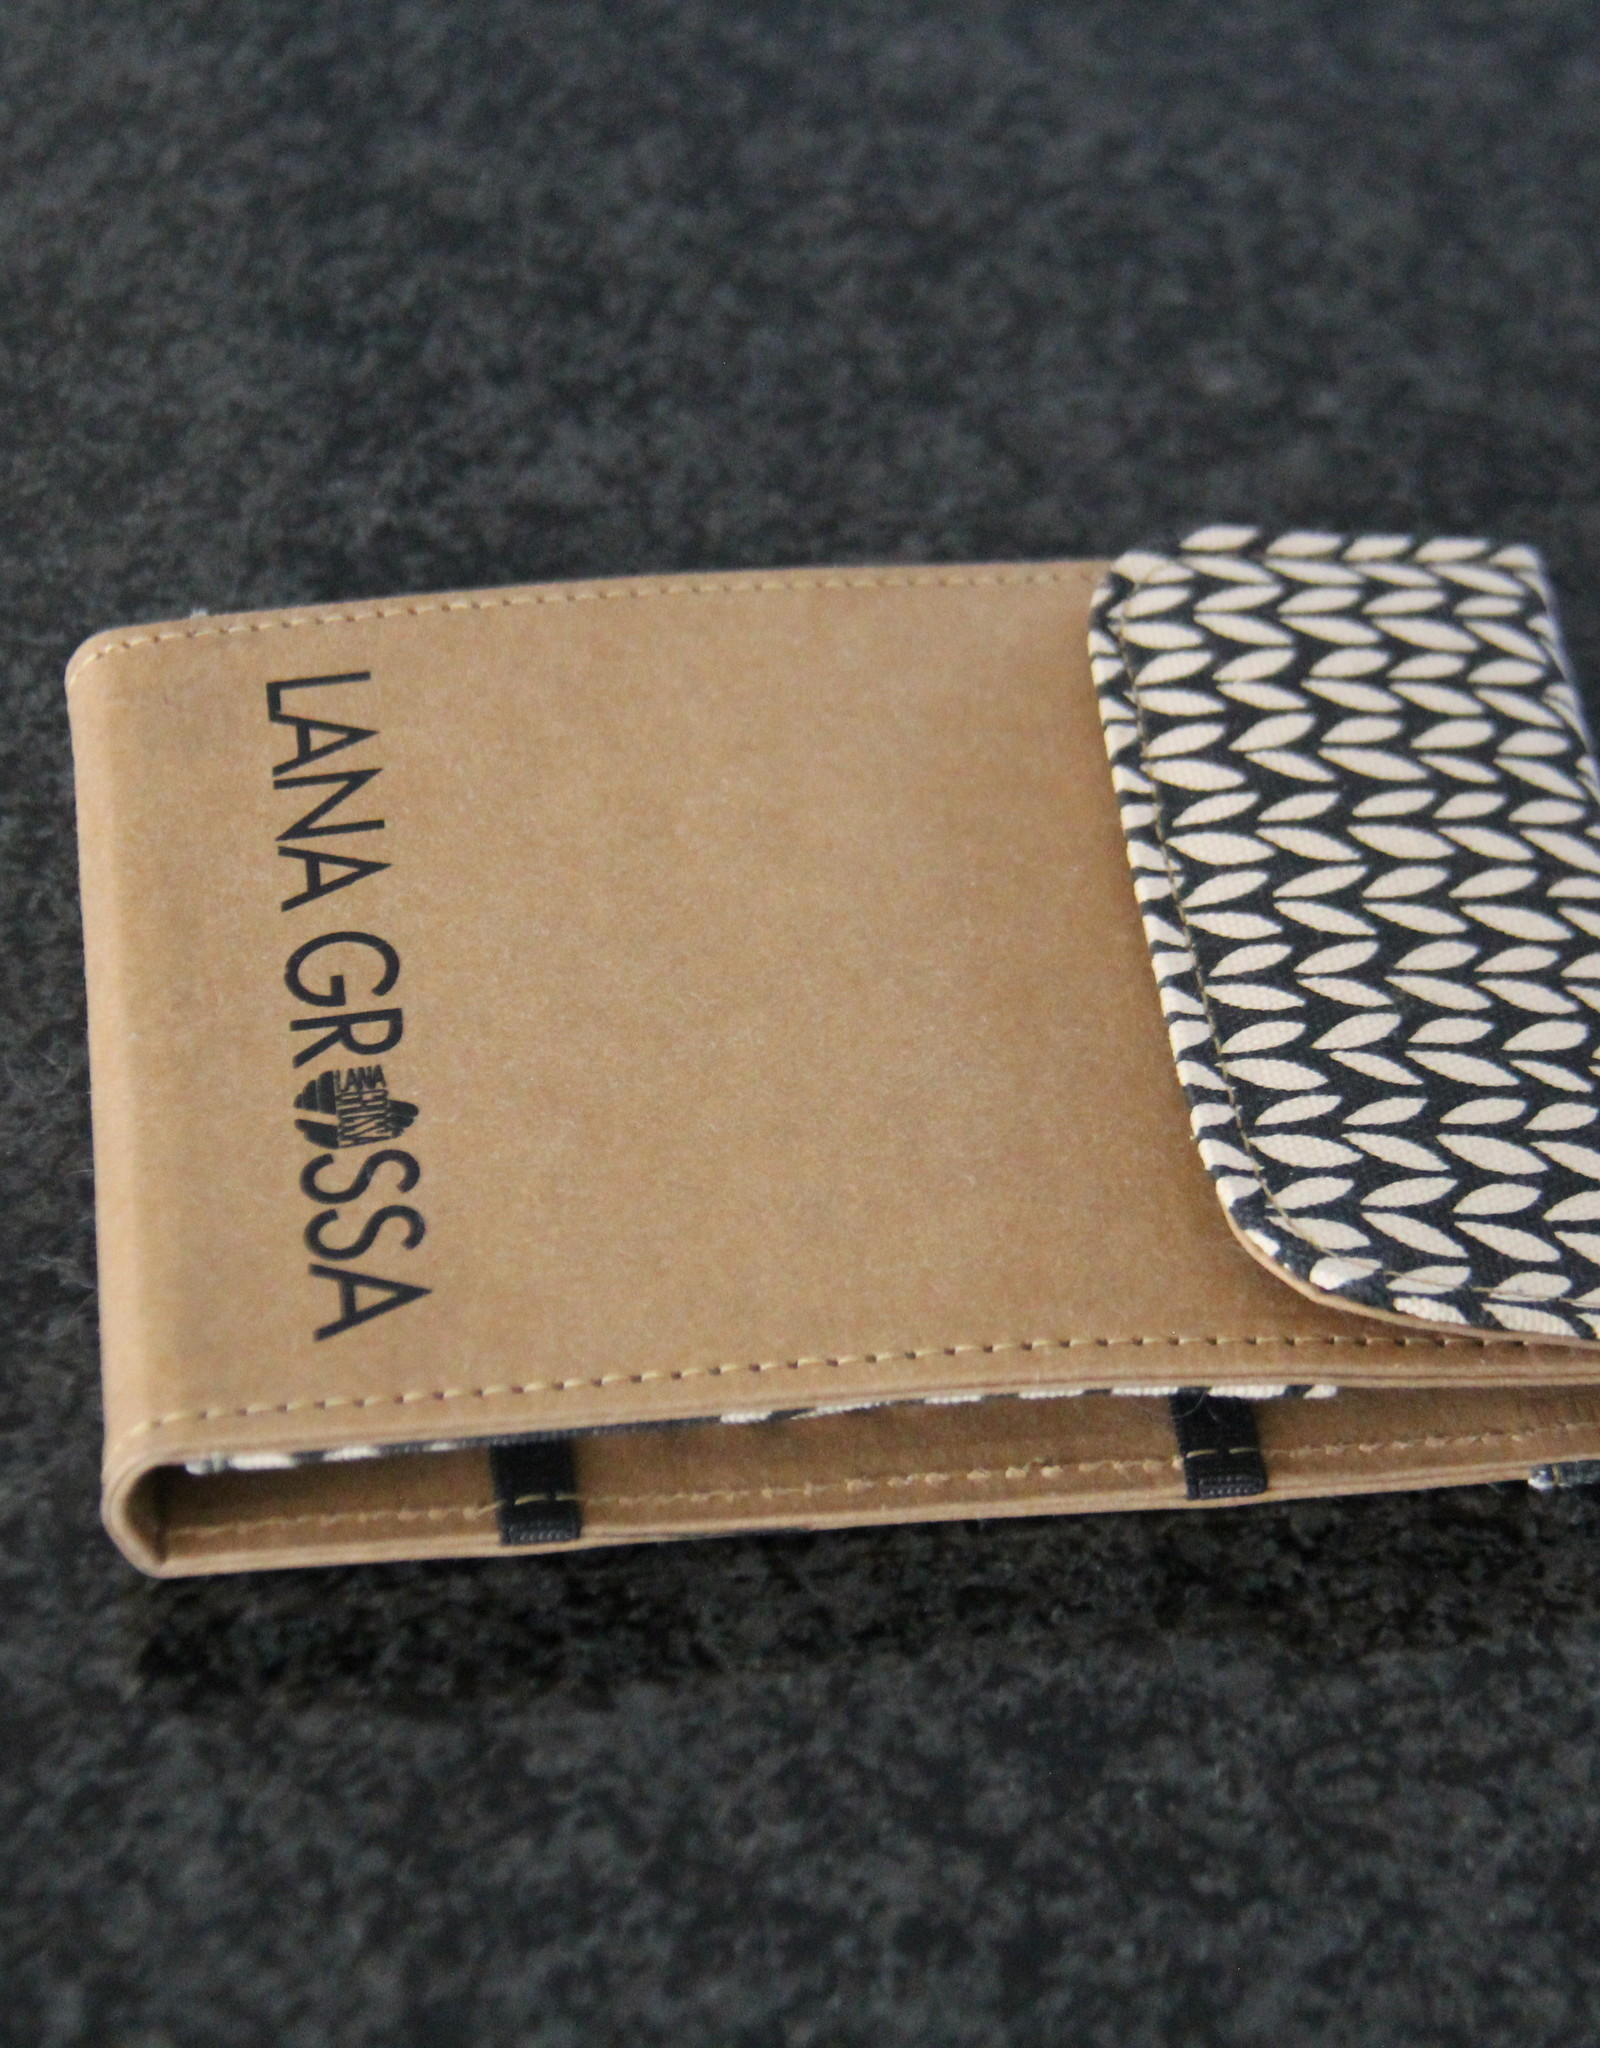 Lana Grossa Lana Grossa Limited Edition Rondbreiset